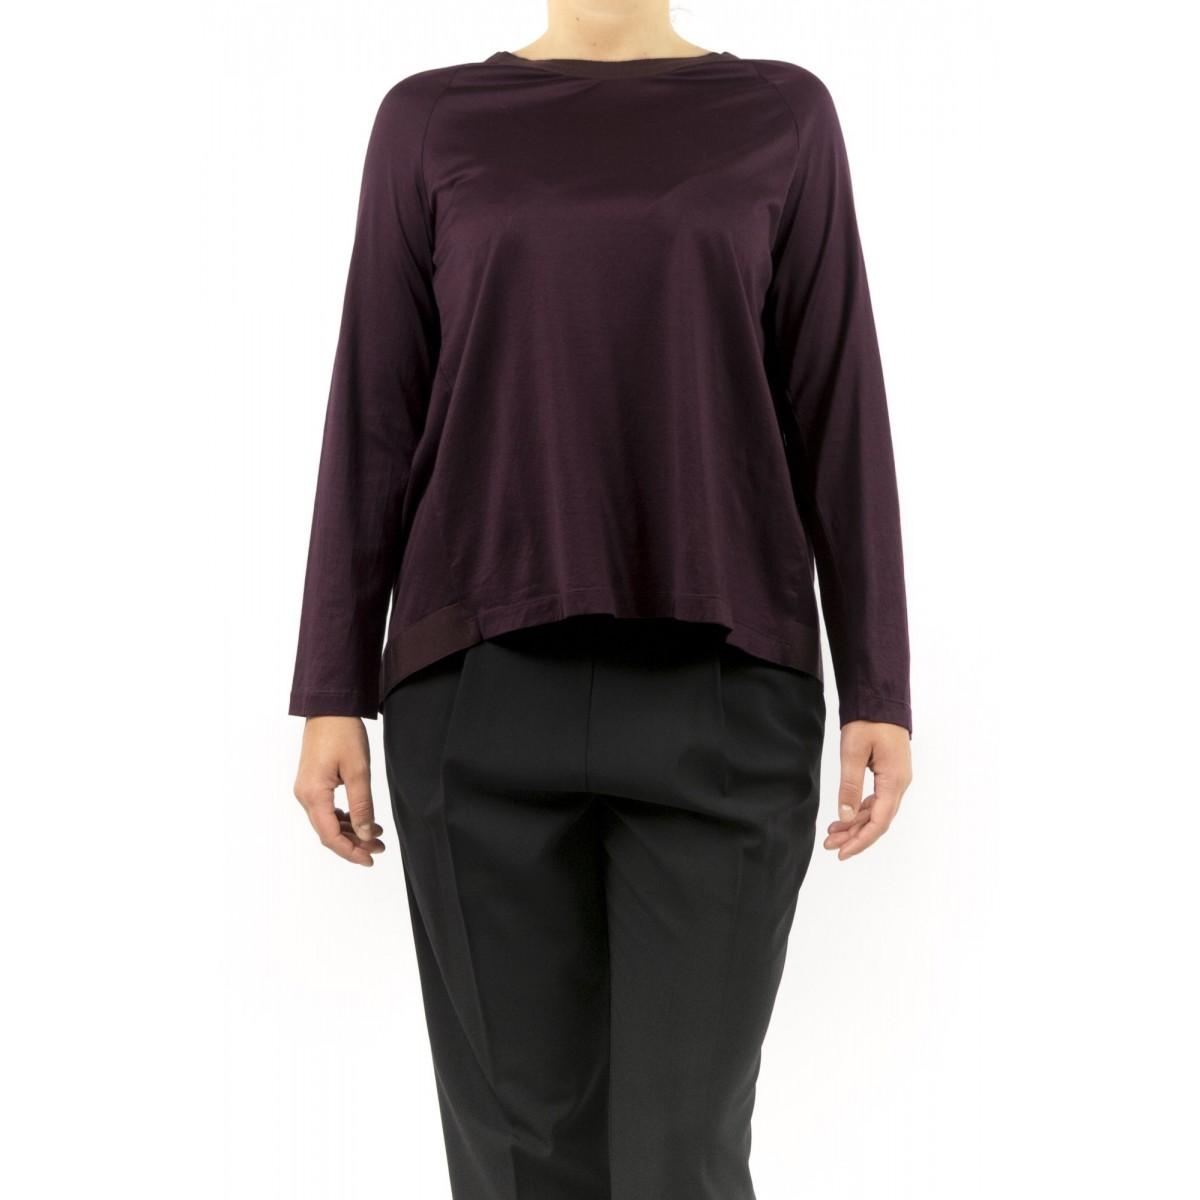 T-Shirt Erika Cavallini - Semicouture - P5I128 236 - vino